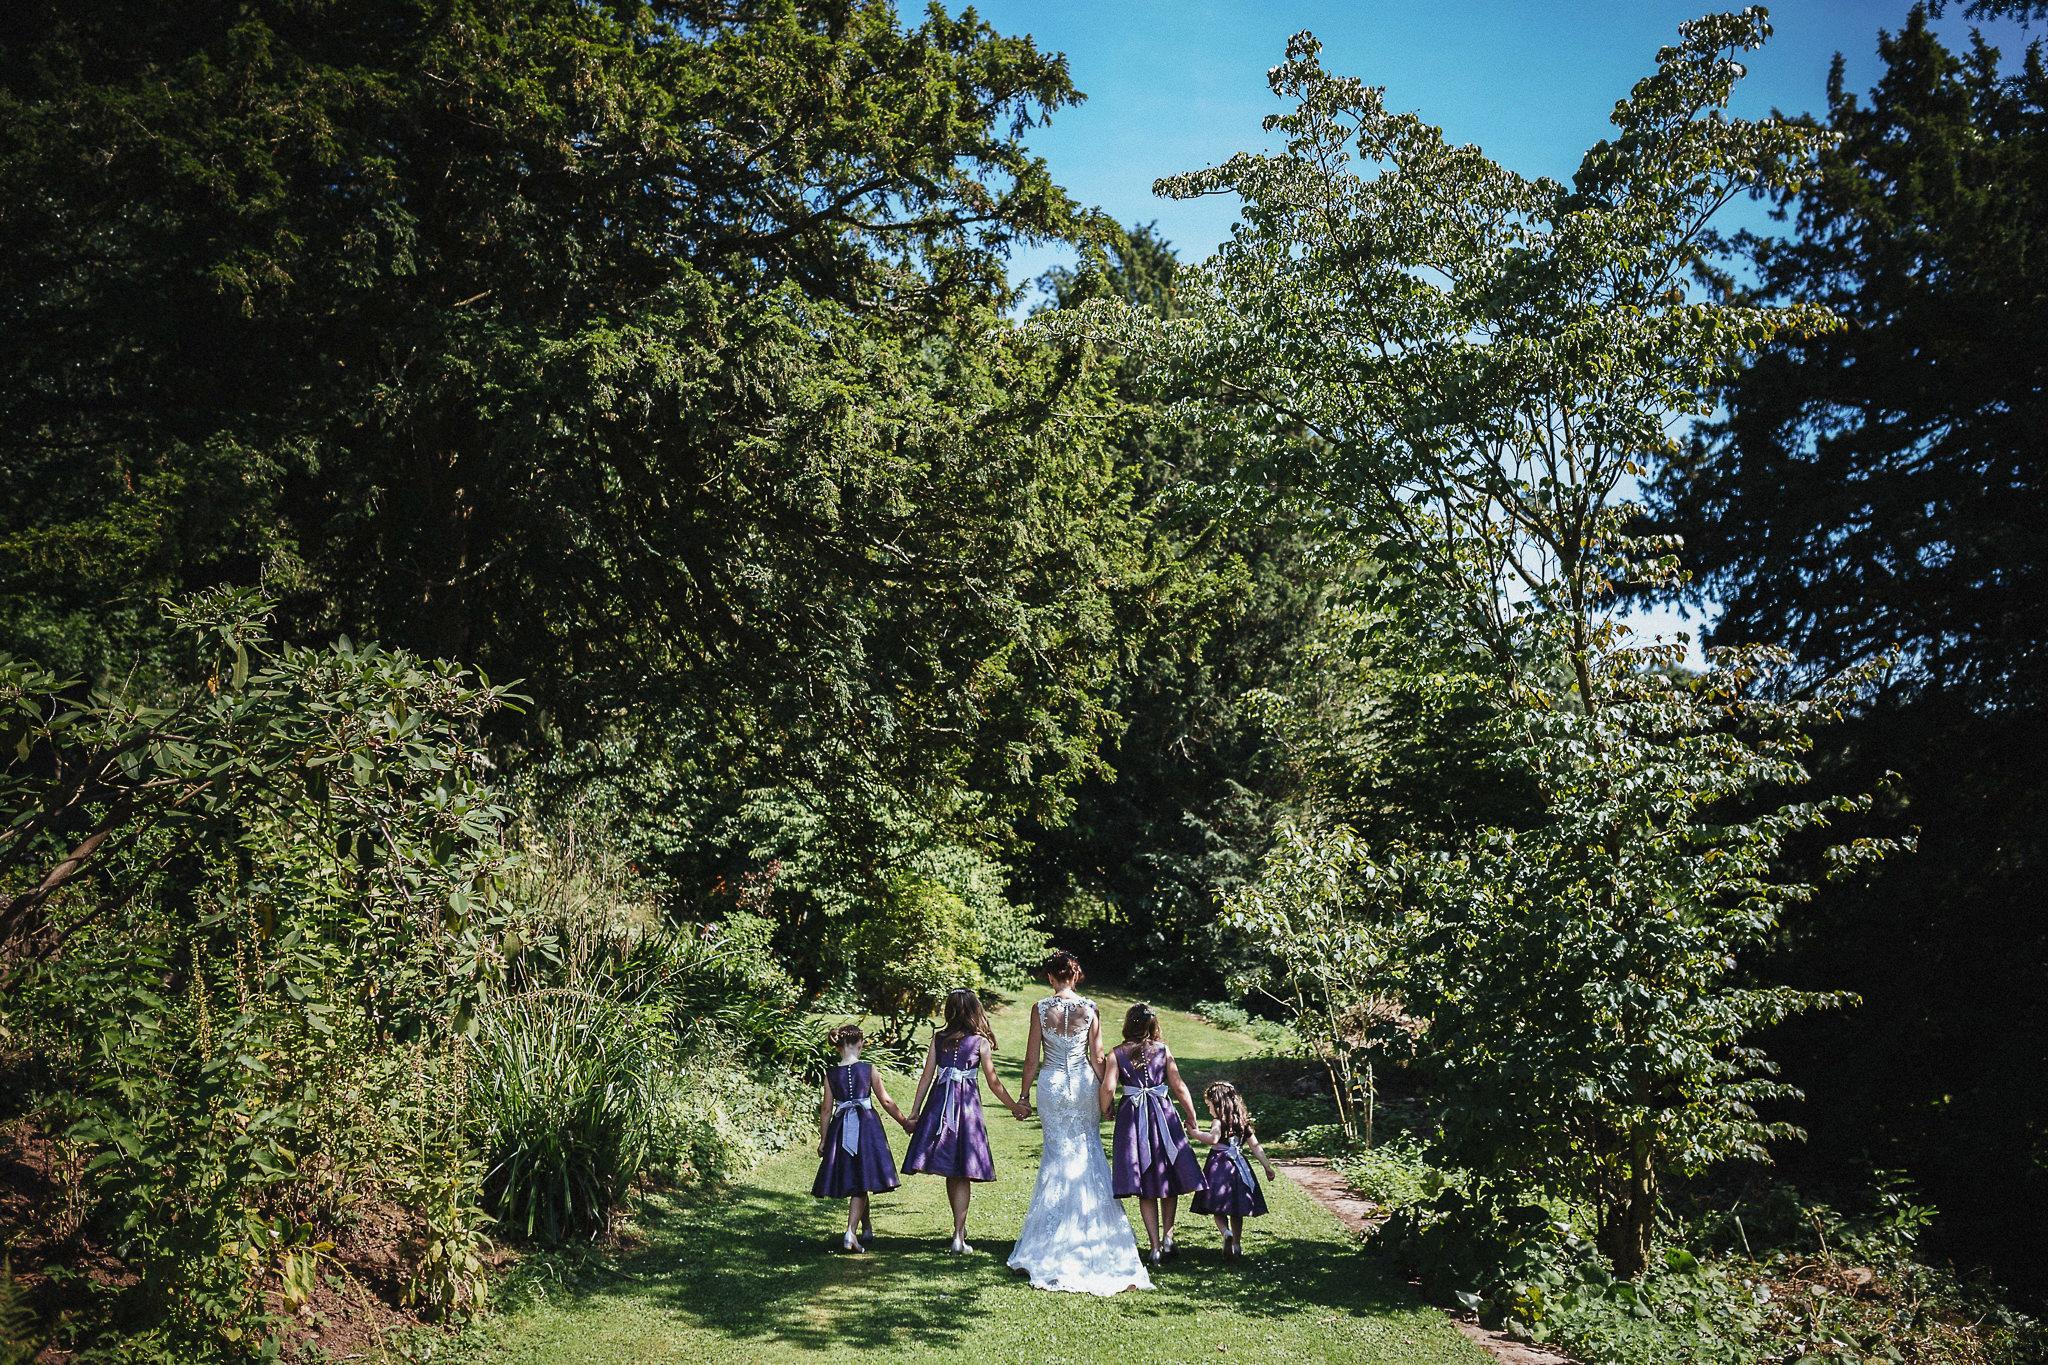 paul-marbrook-Caer-Llan-Wedding-Photographer-90067